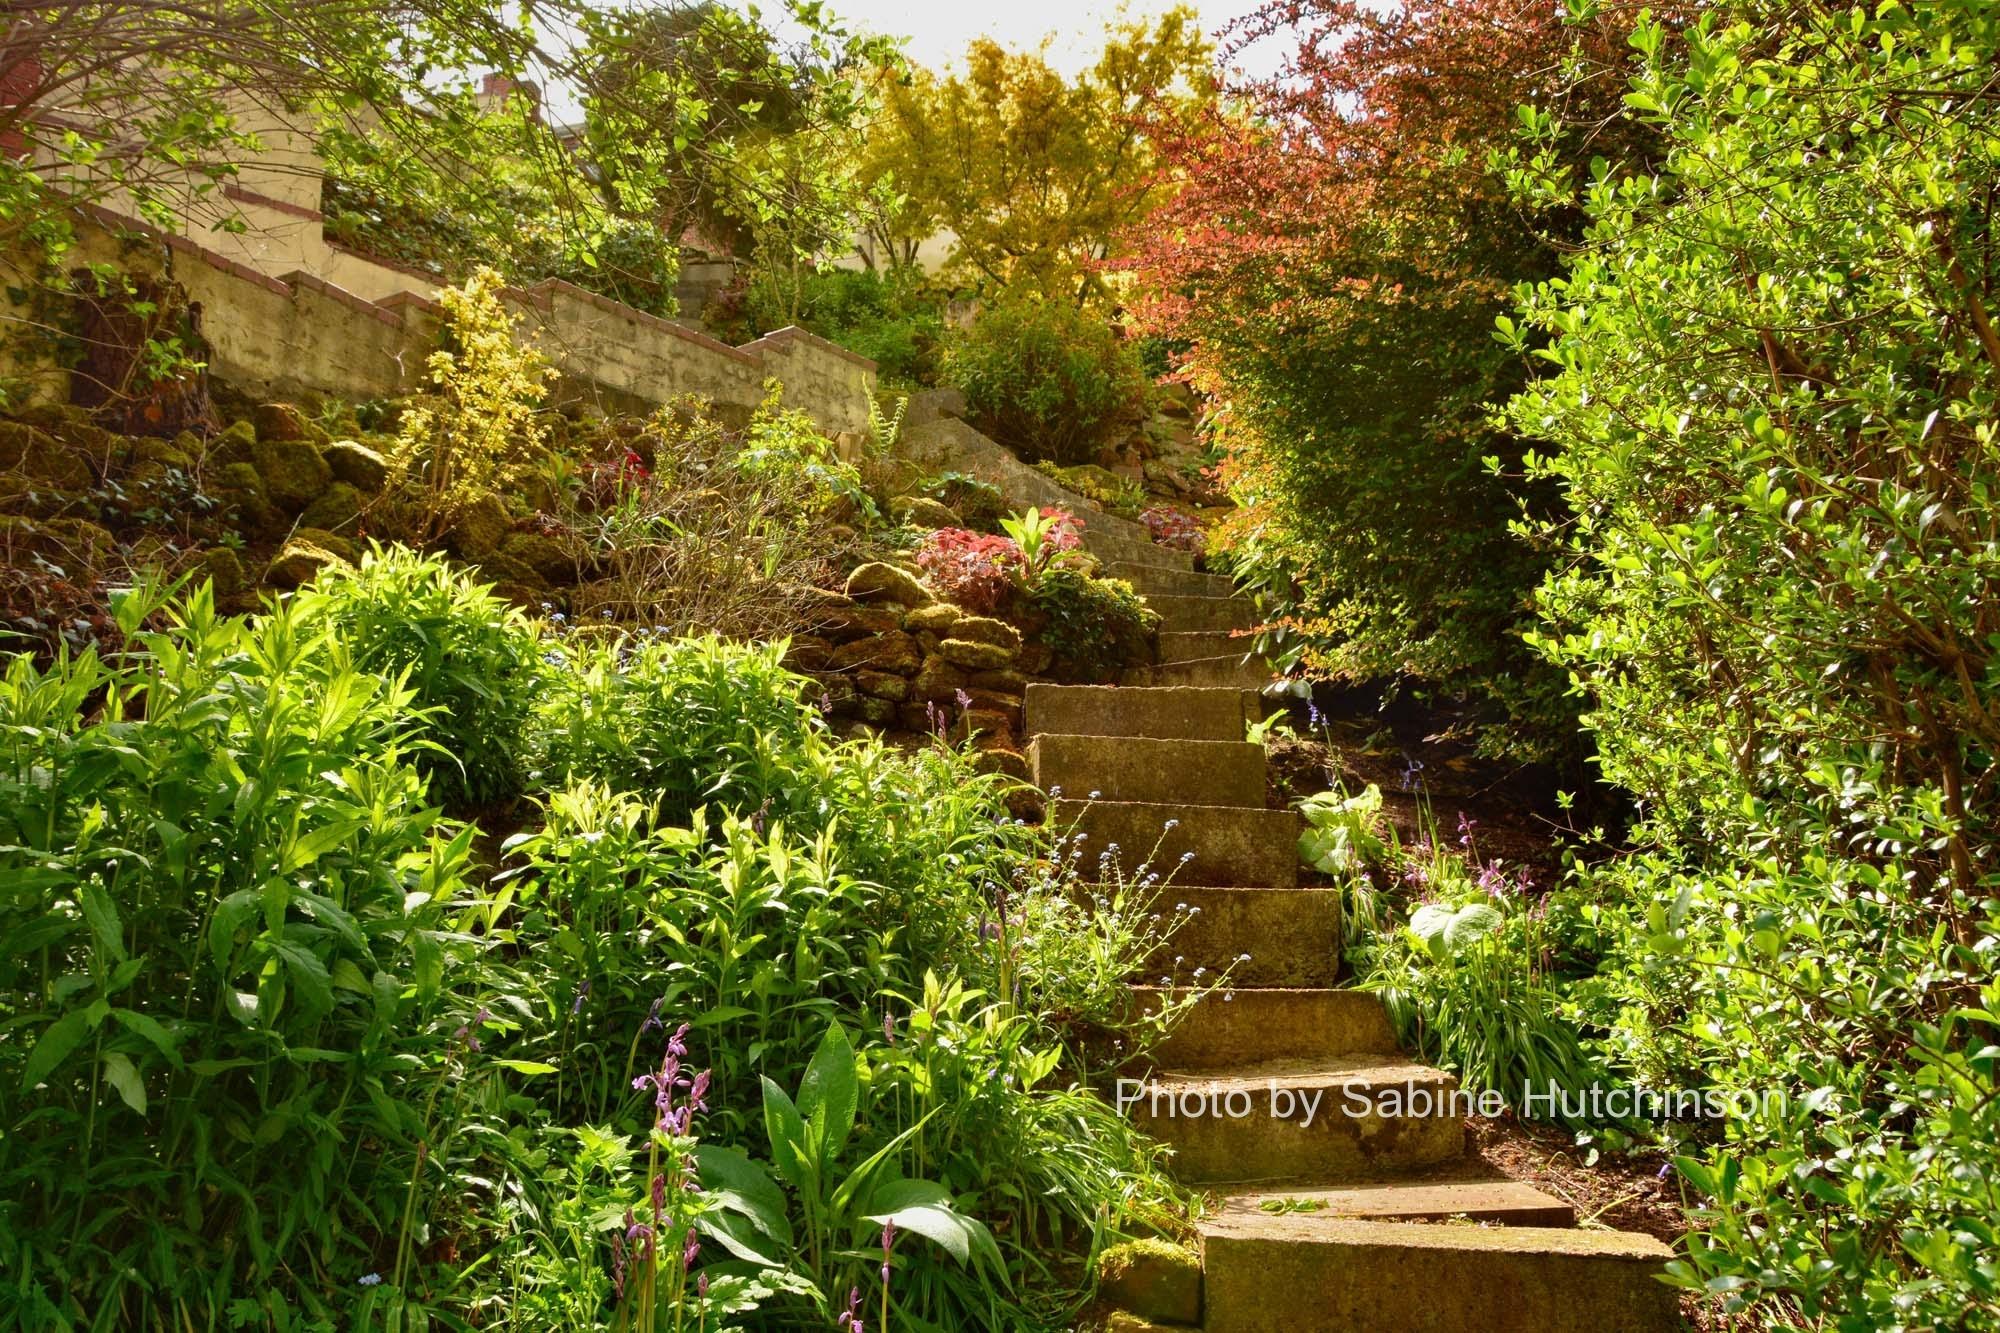 brownhill house garden - april 2017 - shropshire photographs